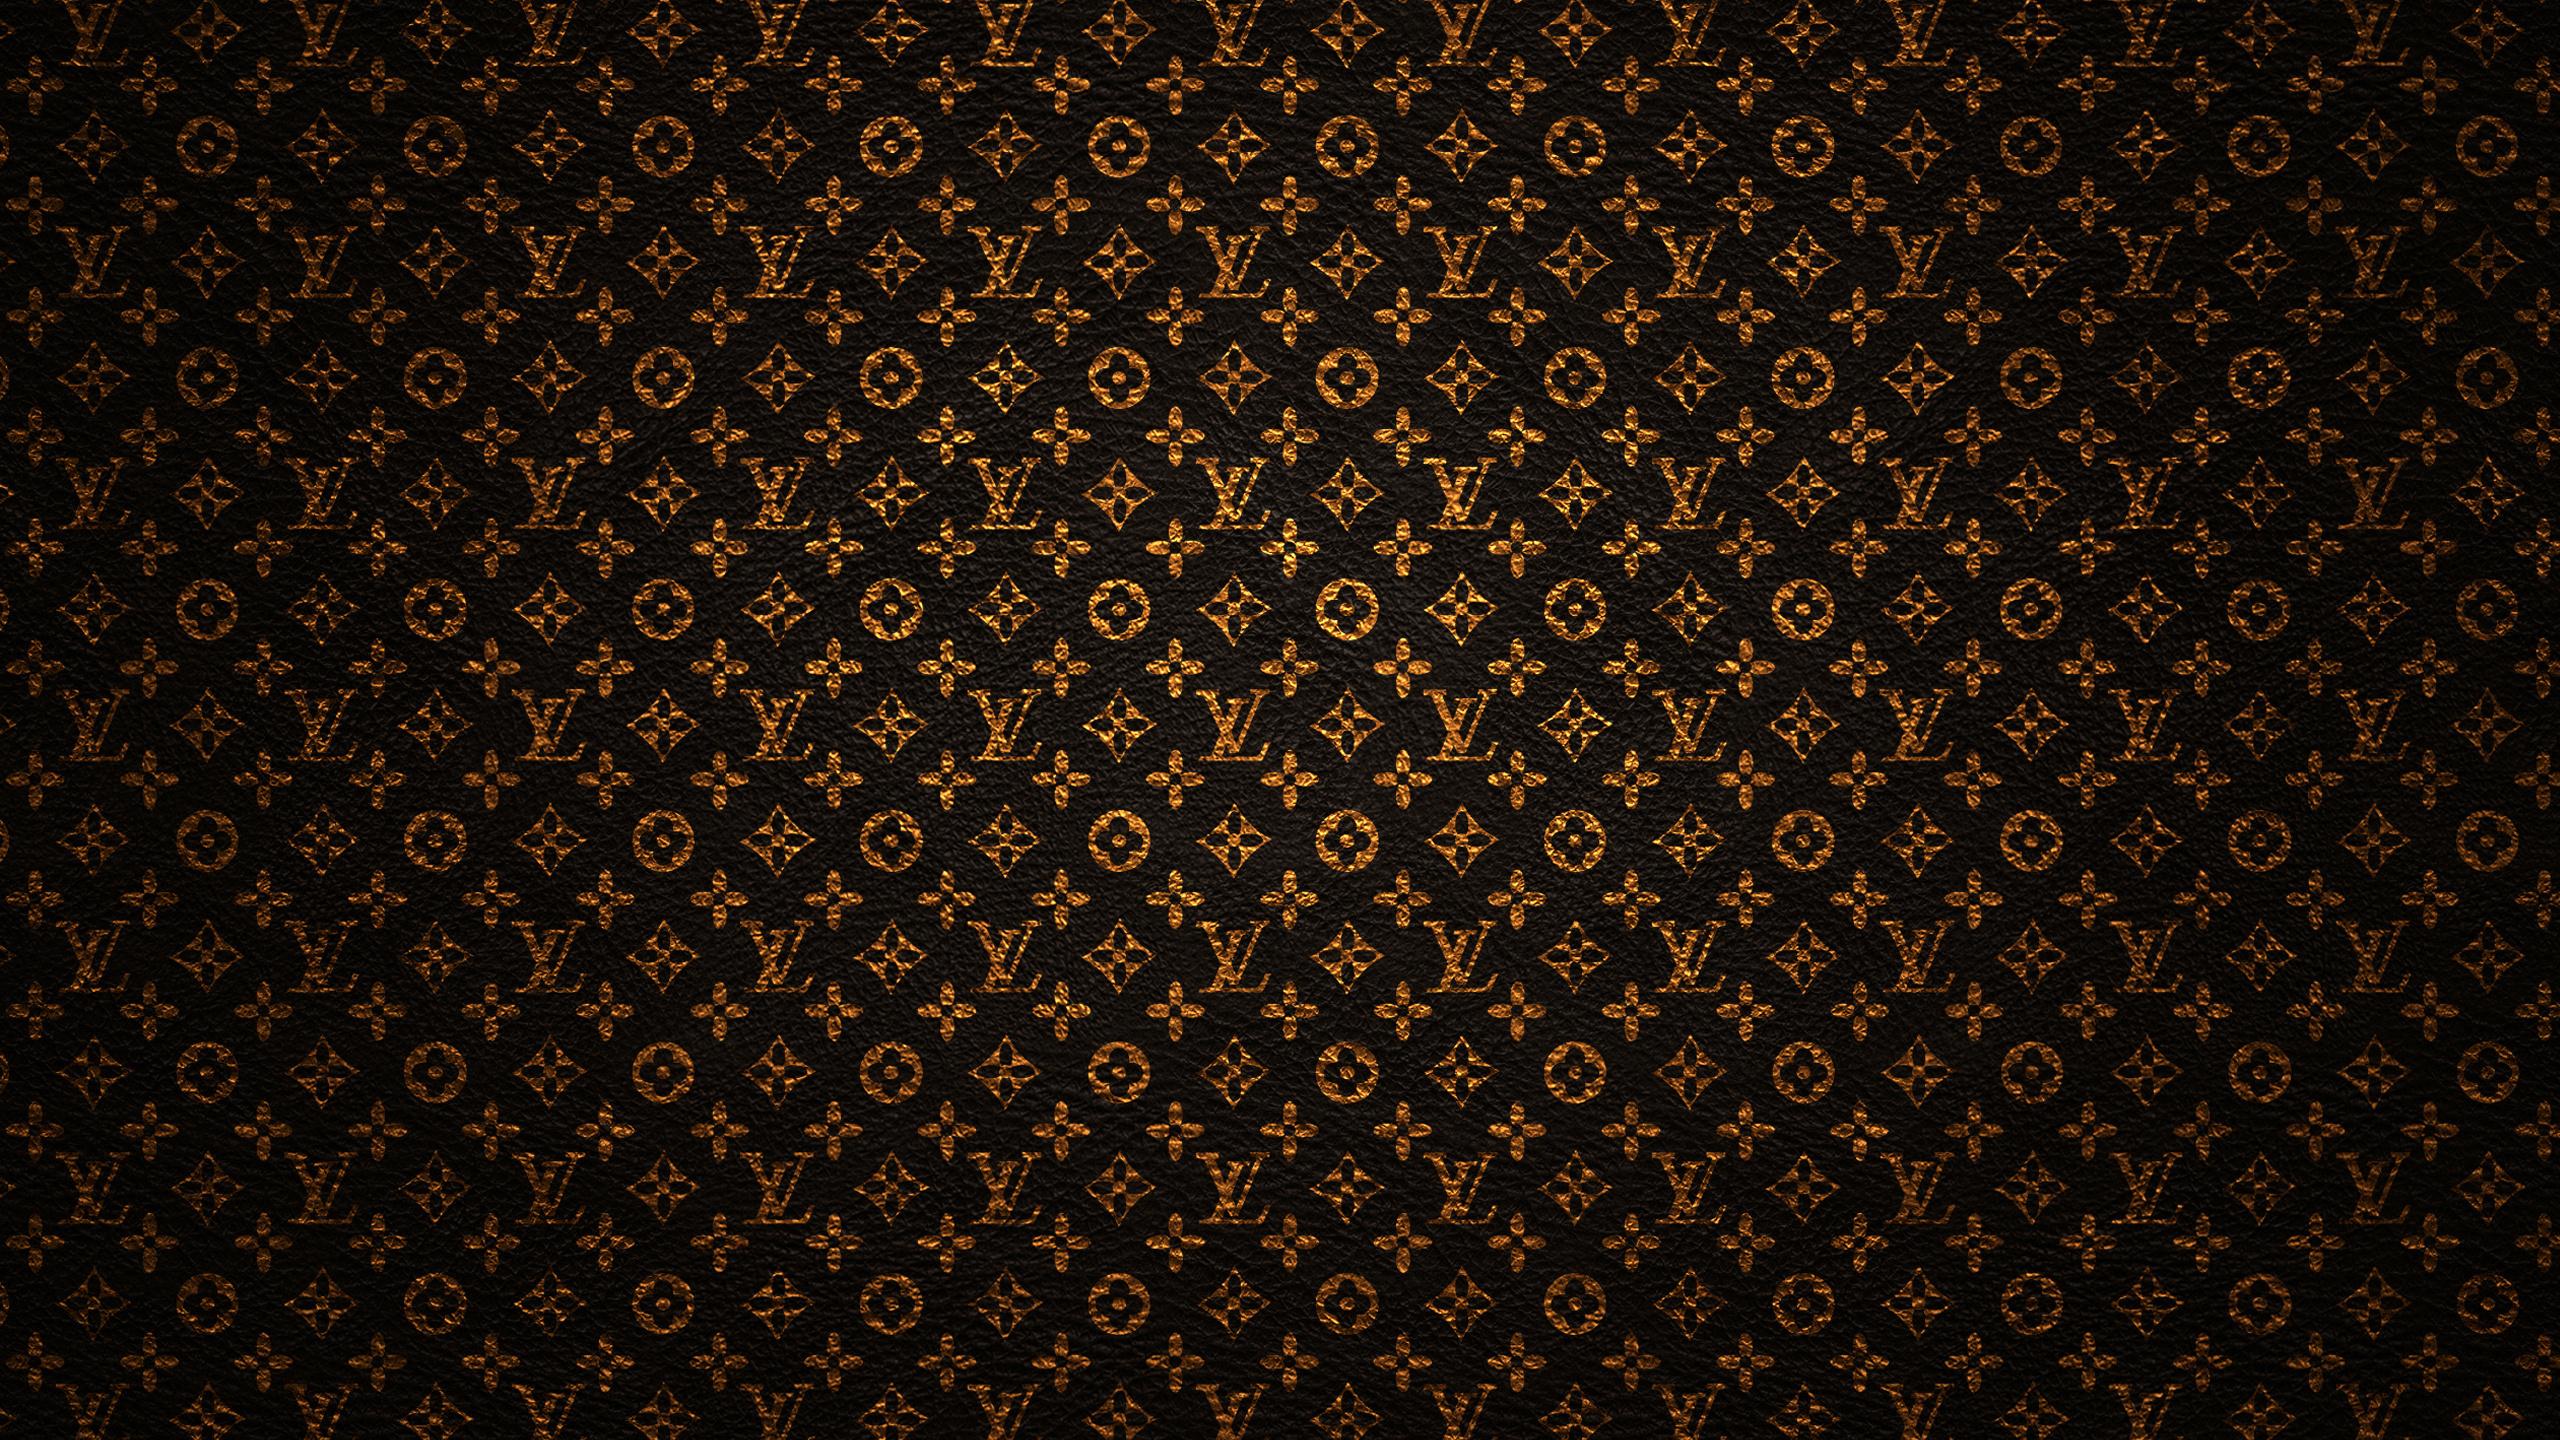 louis vuitton wallpapers images photos pictures backgrounds. Black Bedroom Furniture Sets. Home Design Ideas